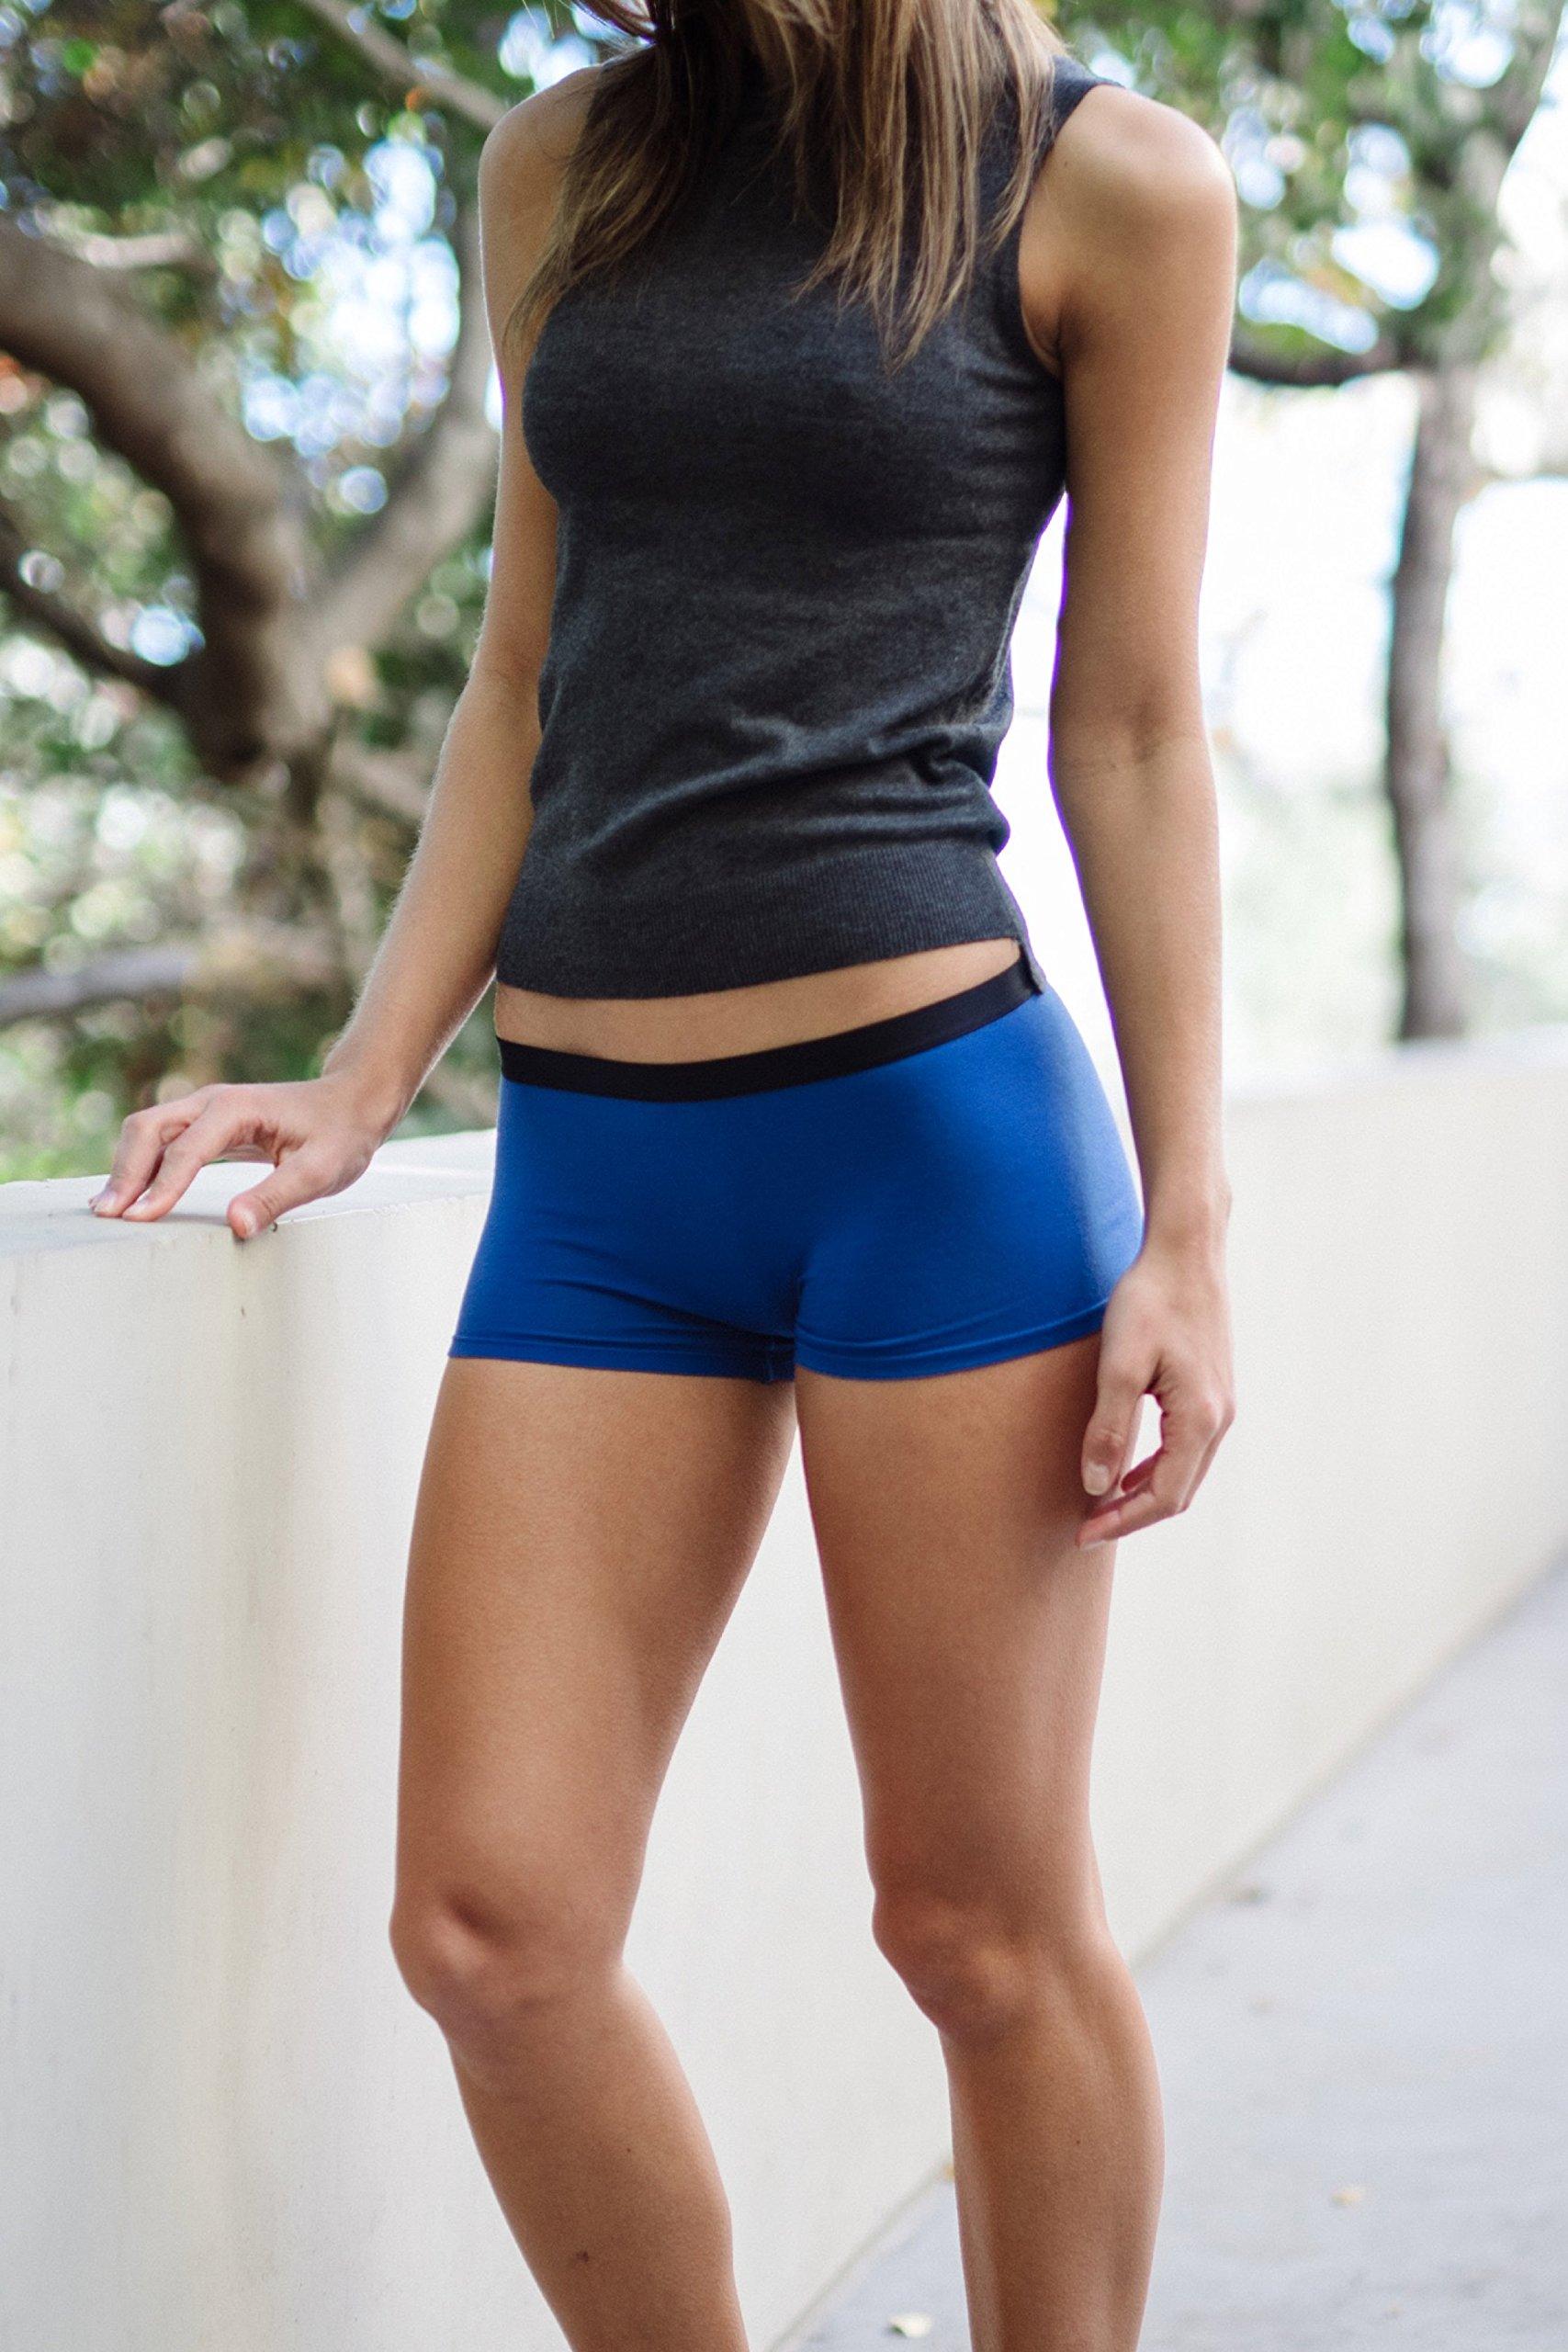 2af49c58965 COMFORTABLE CLUB Women s Modal Microfiber Boyshorts Panties Underwear  2-Pack (Jet Black